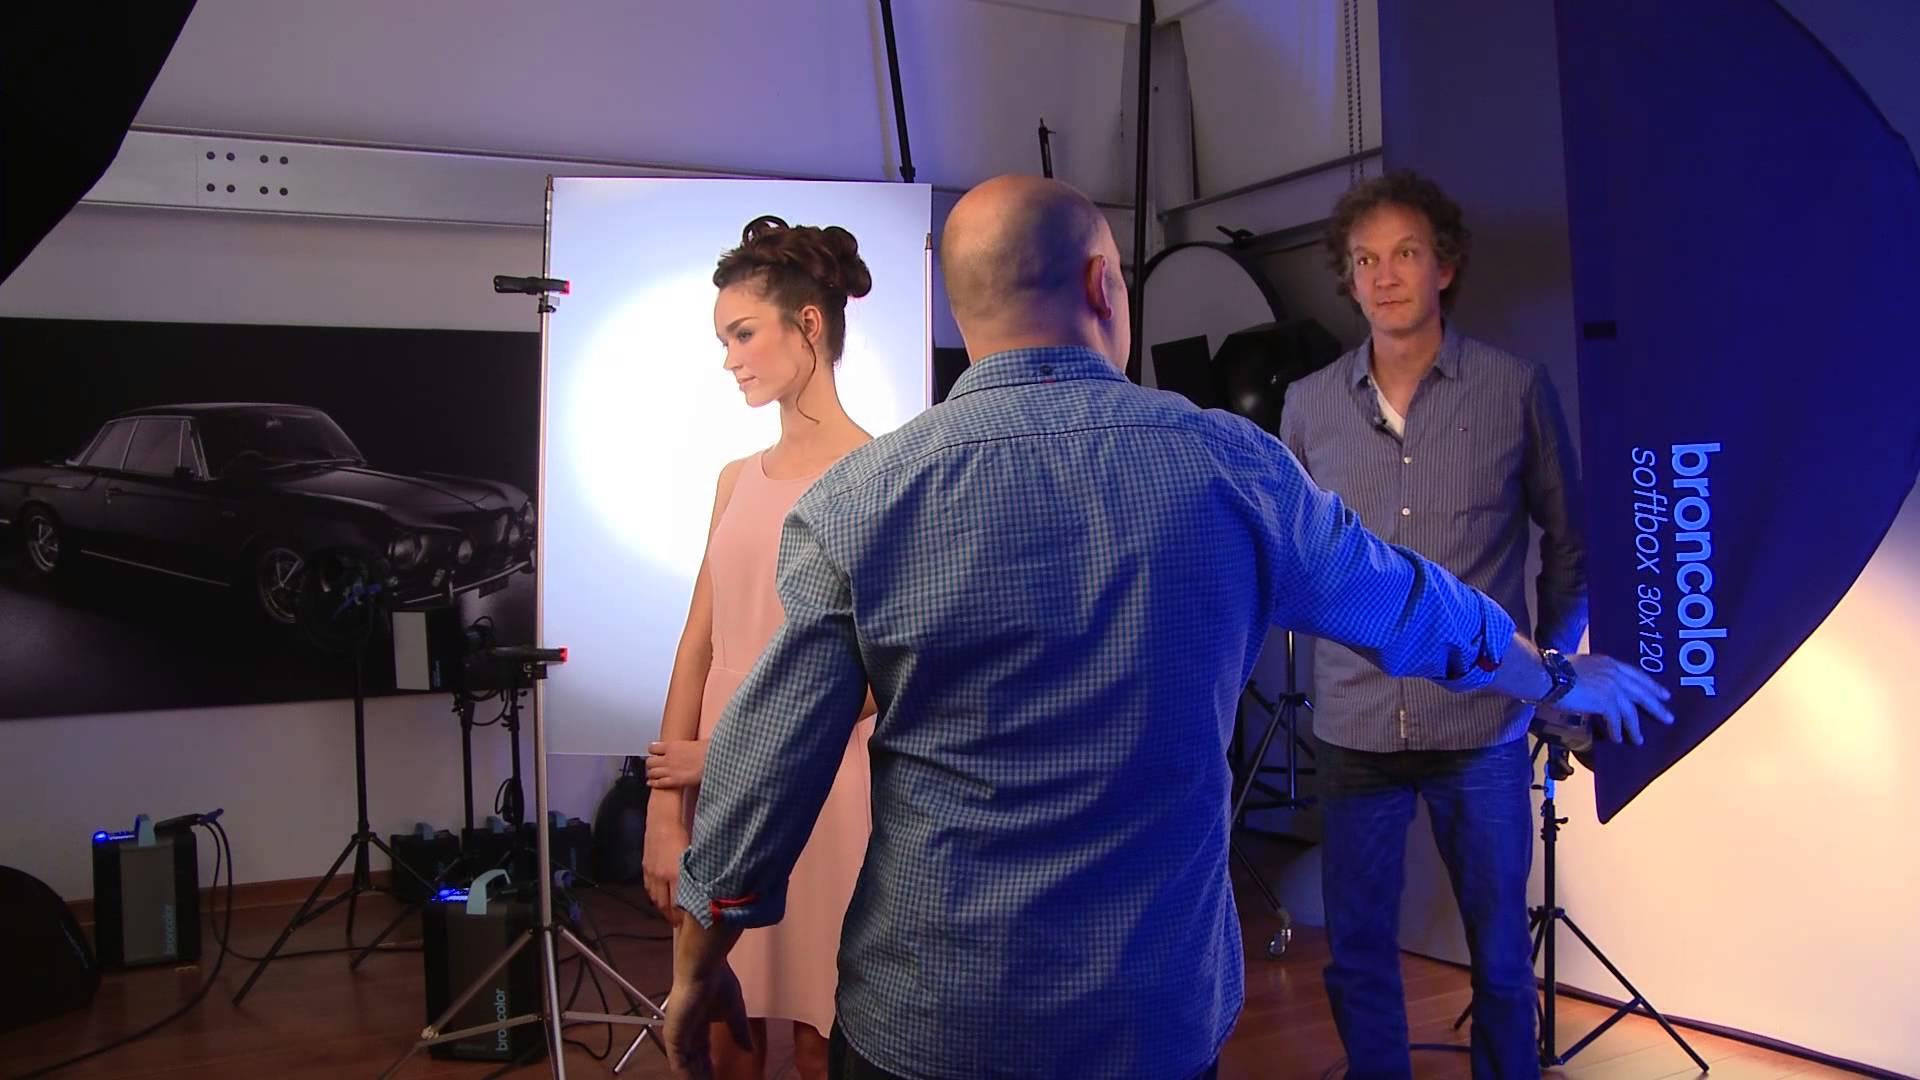 Iluminación: videotutorial con dos esquemas de fotografía de belleza sutiles